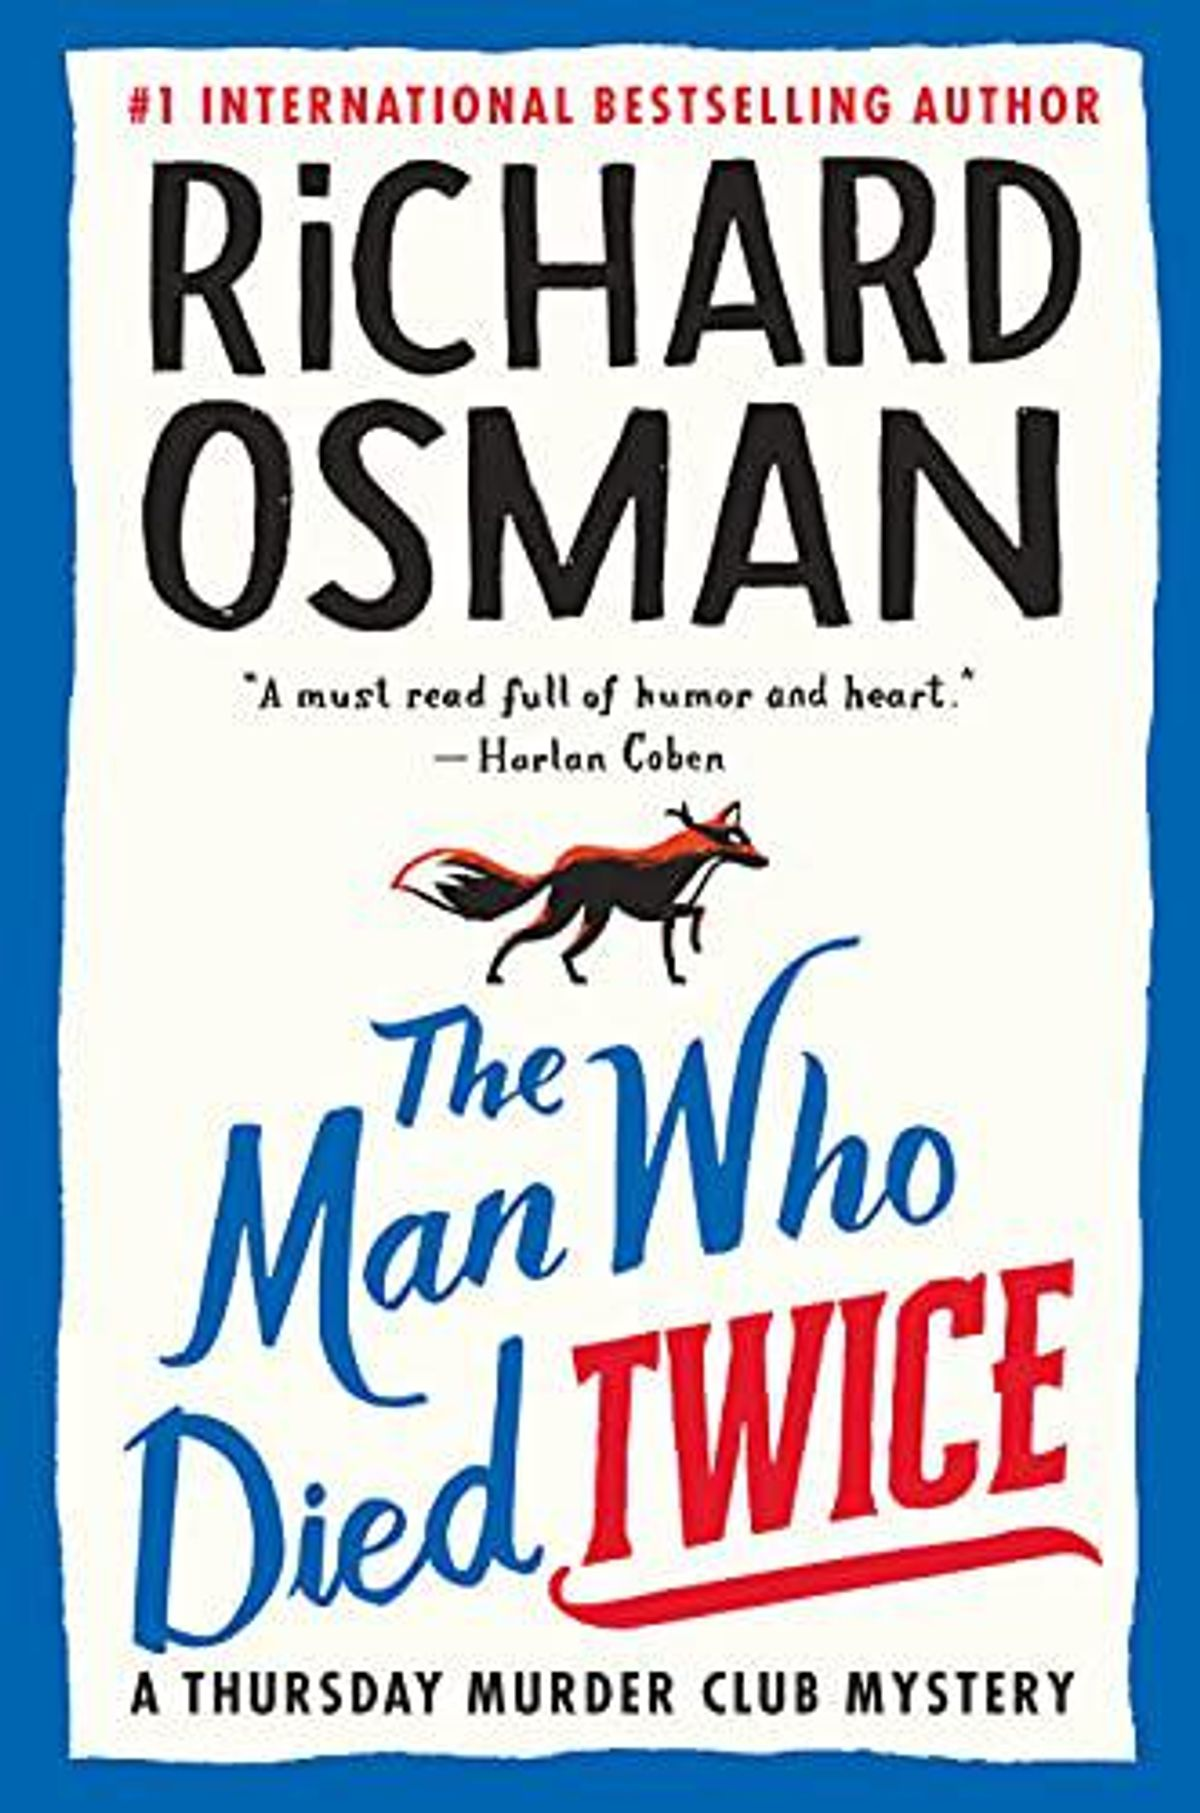 richard osman the man who died twice a thursday murder club mystery